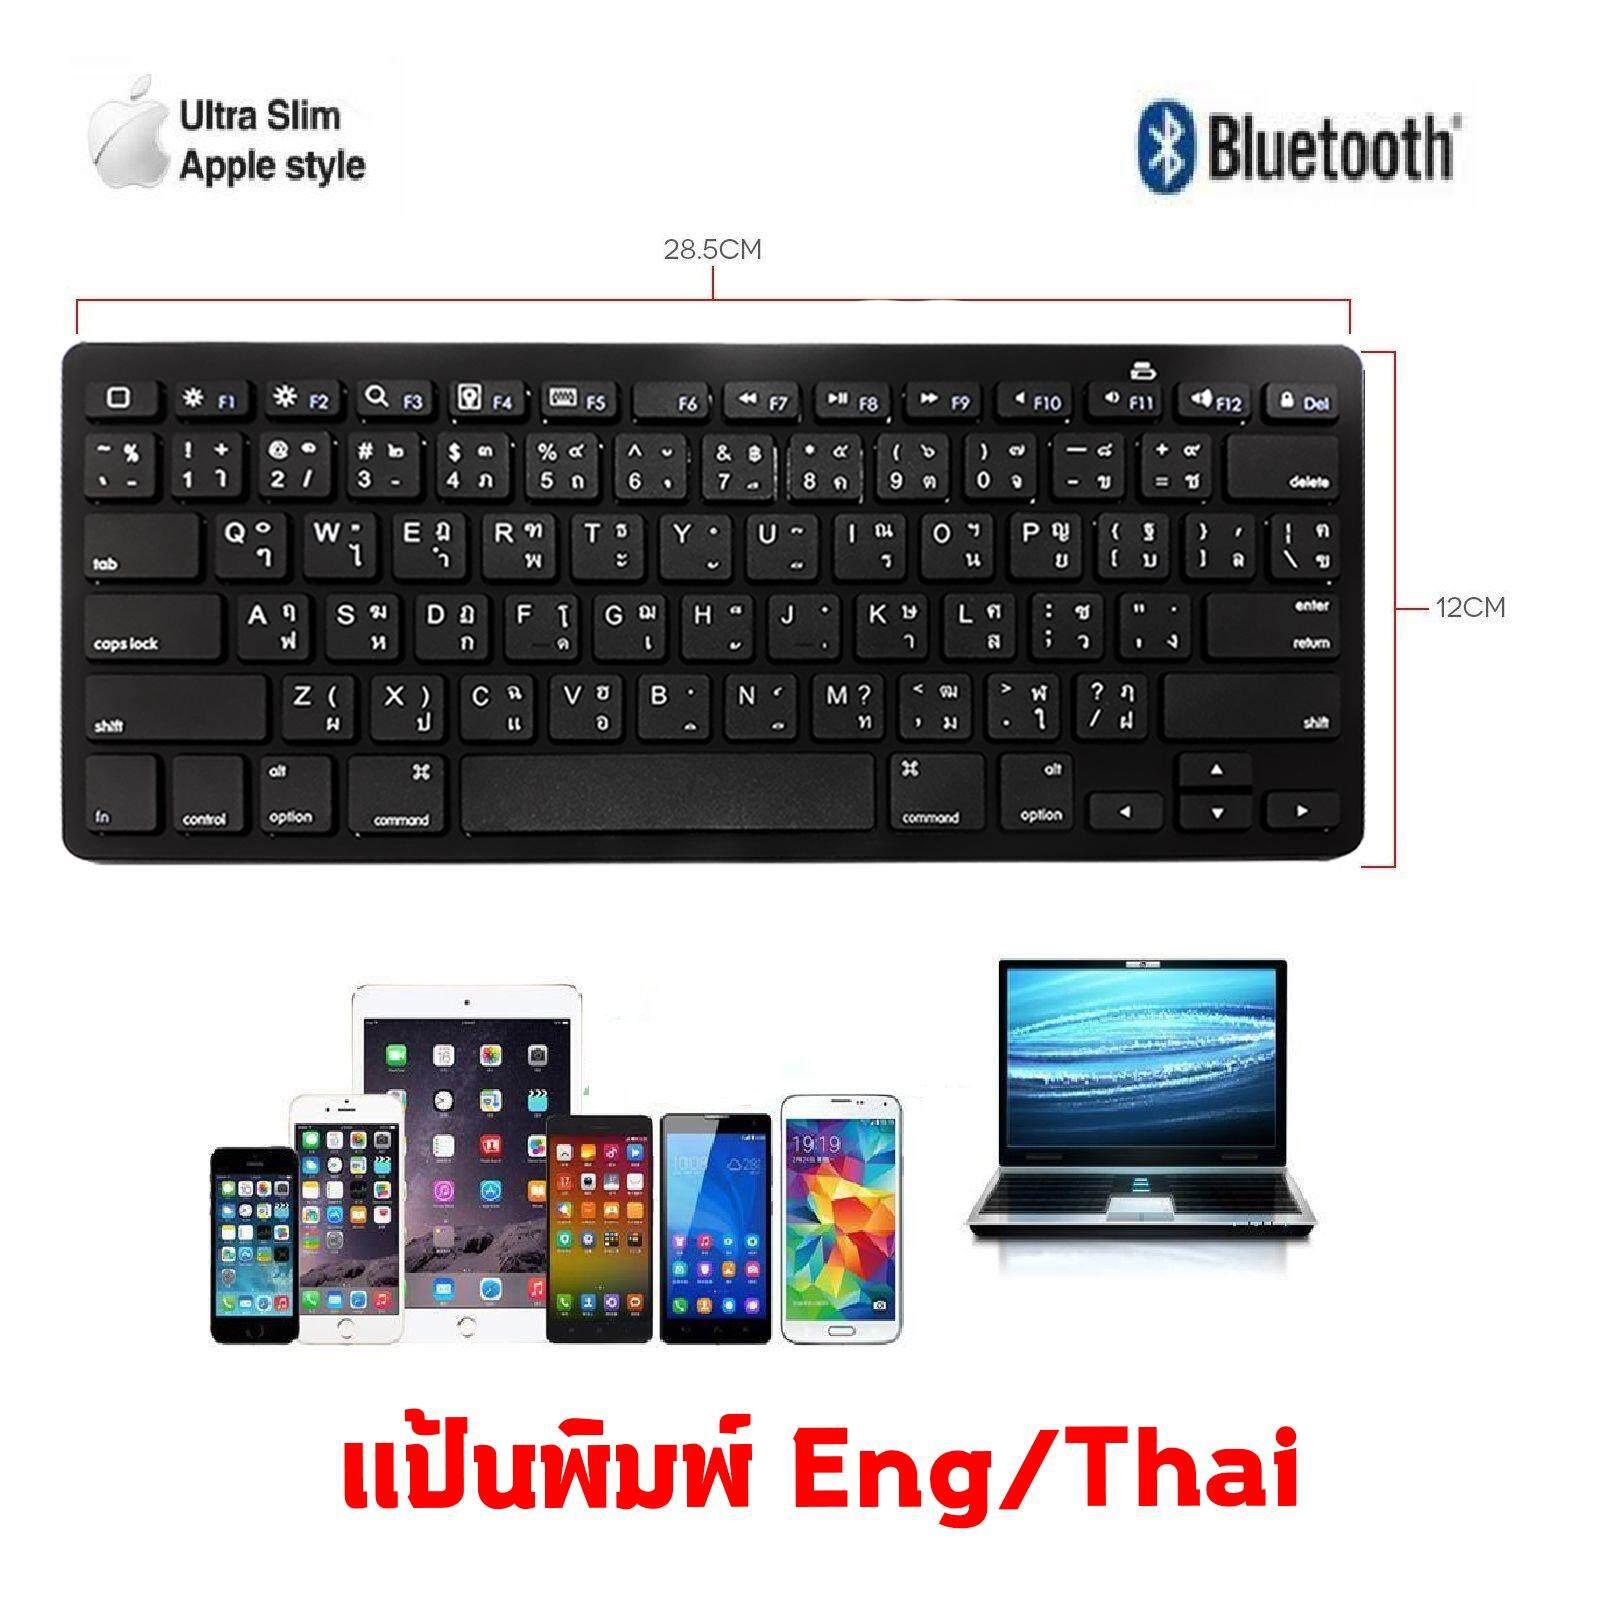 Keyboard บลูทูธ Bluetooth Keyboard คียบอร์ดไร้สายสำหรับมือถือทุกรุ่น Wireless Bluetooth Keyboard Th-En.